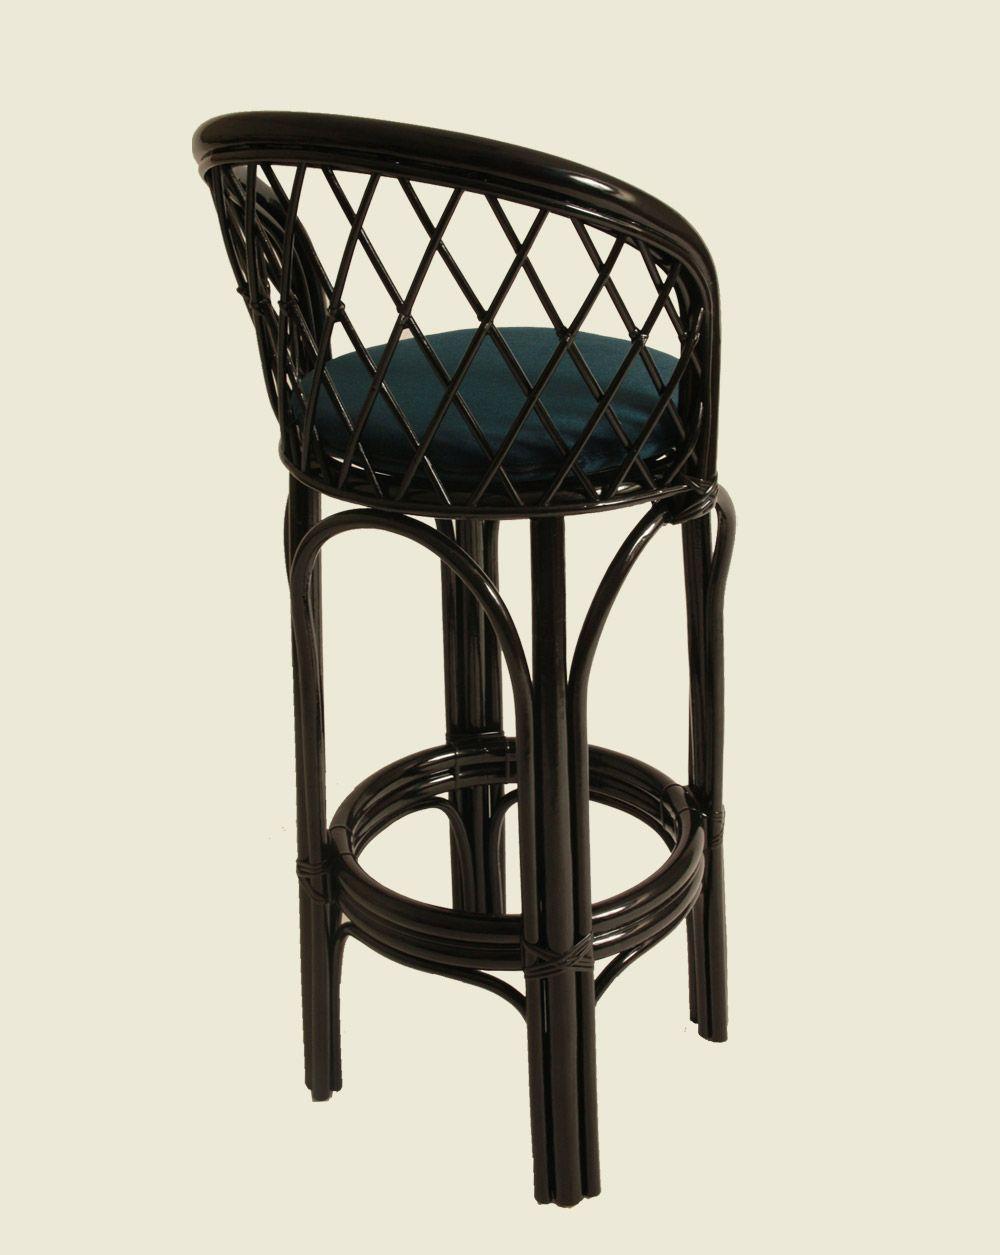 Laquered Panier Highchair Black Maison Drucker Stool High Chair Decor